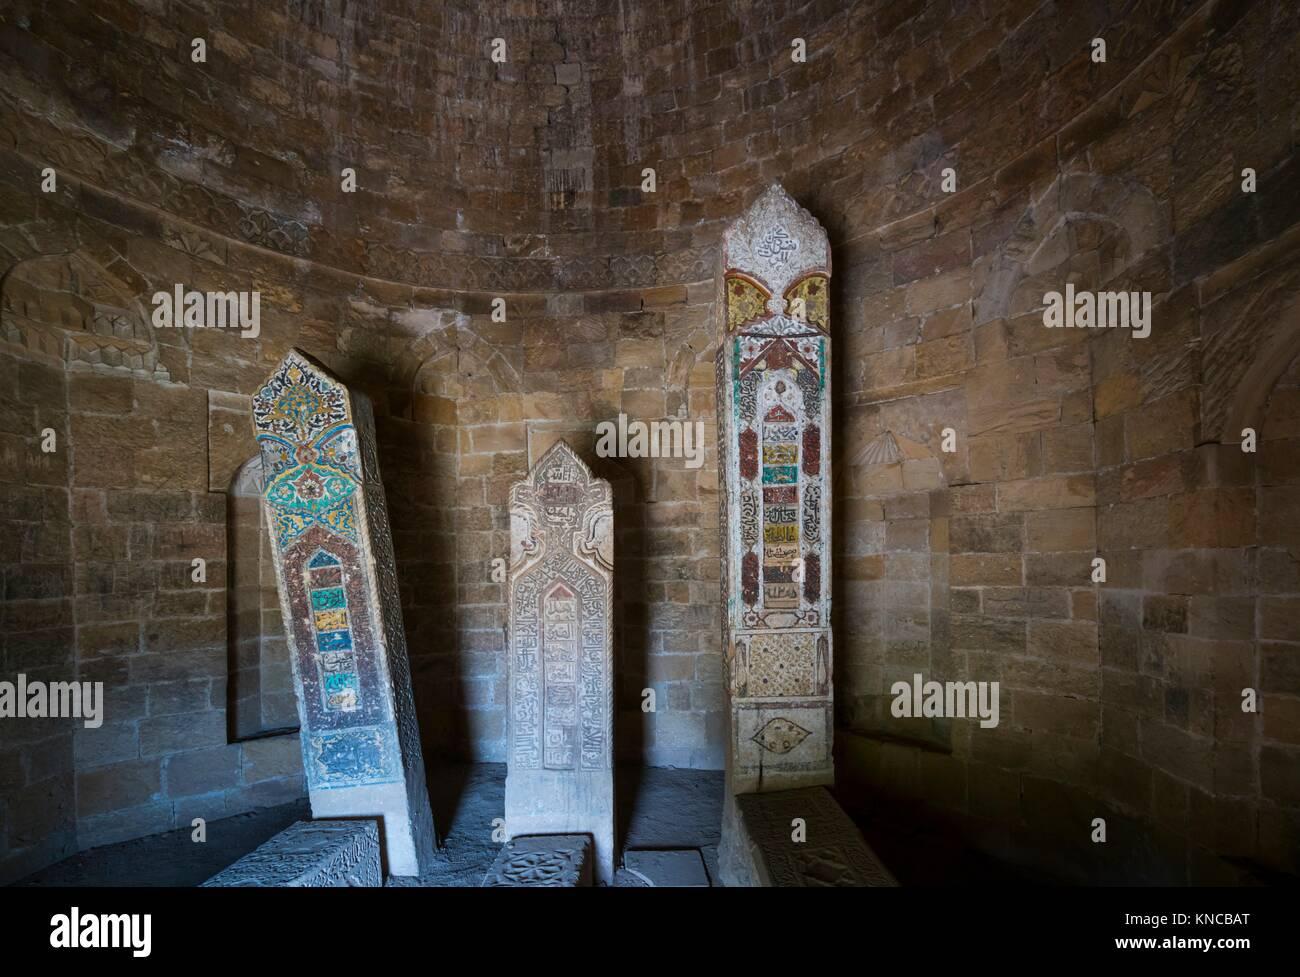 Yeddi Gumbaz Mausoleum, Shamakhi Town, Azerbaijan, Middle East. Stock Photo